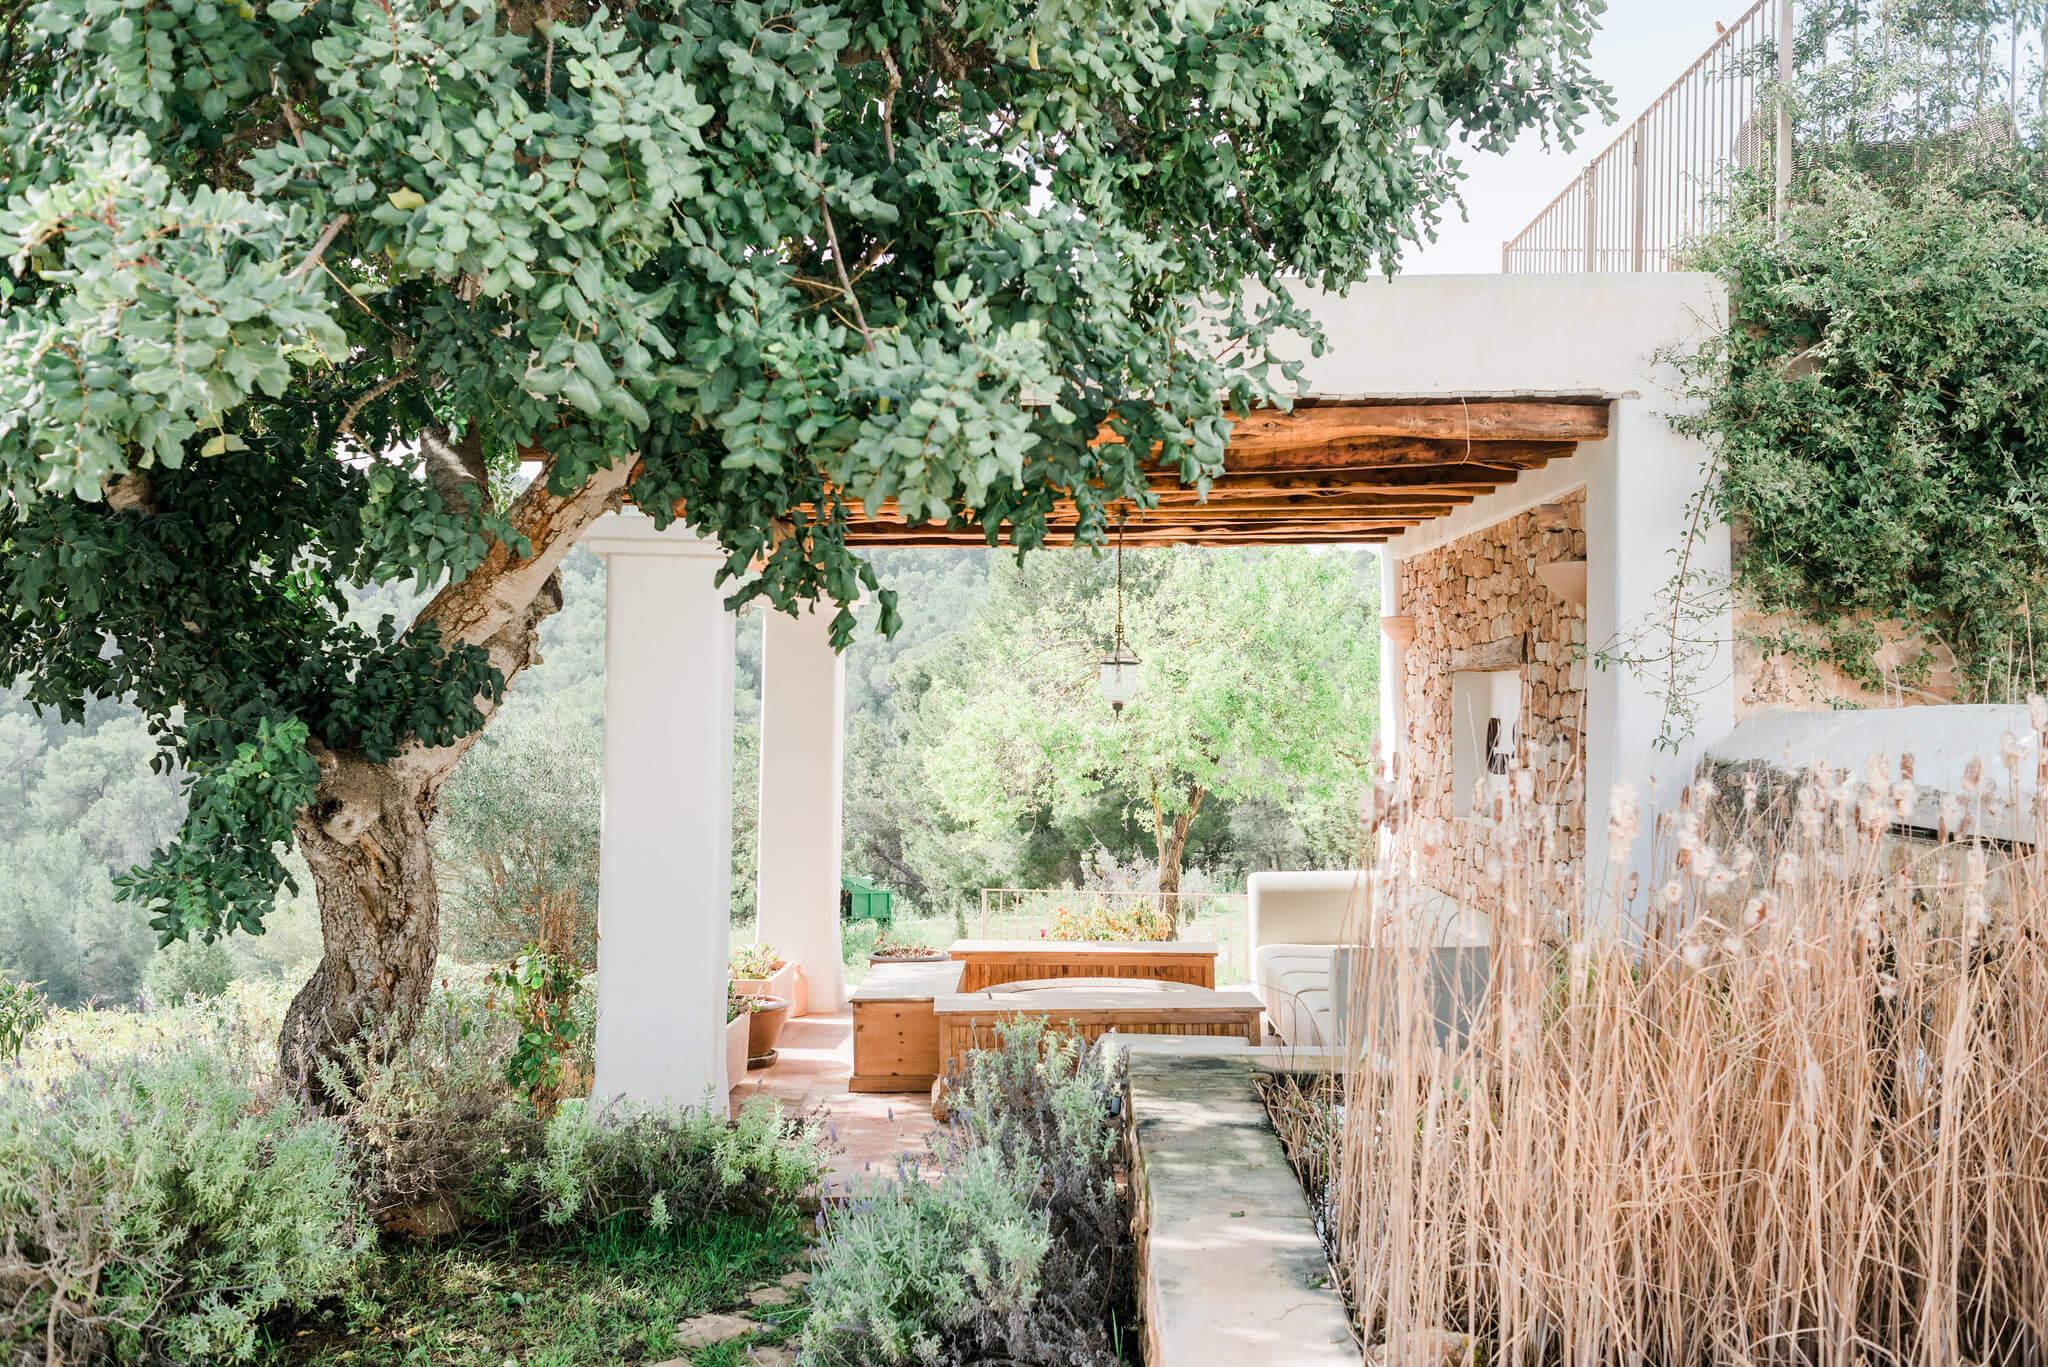 https://www.white-ibiza.com/wp-content/uploads/2020/06/white-ibiza-villas-los-corrales-exterior-path.jpg